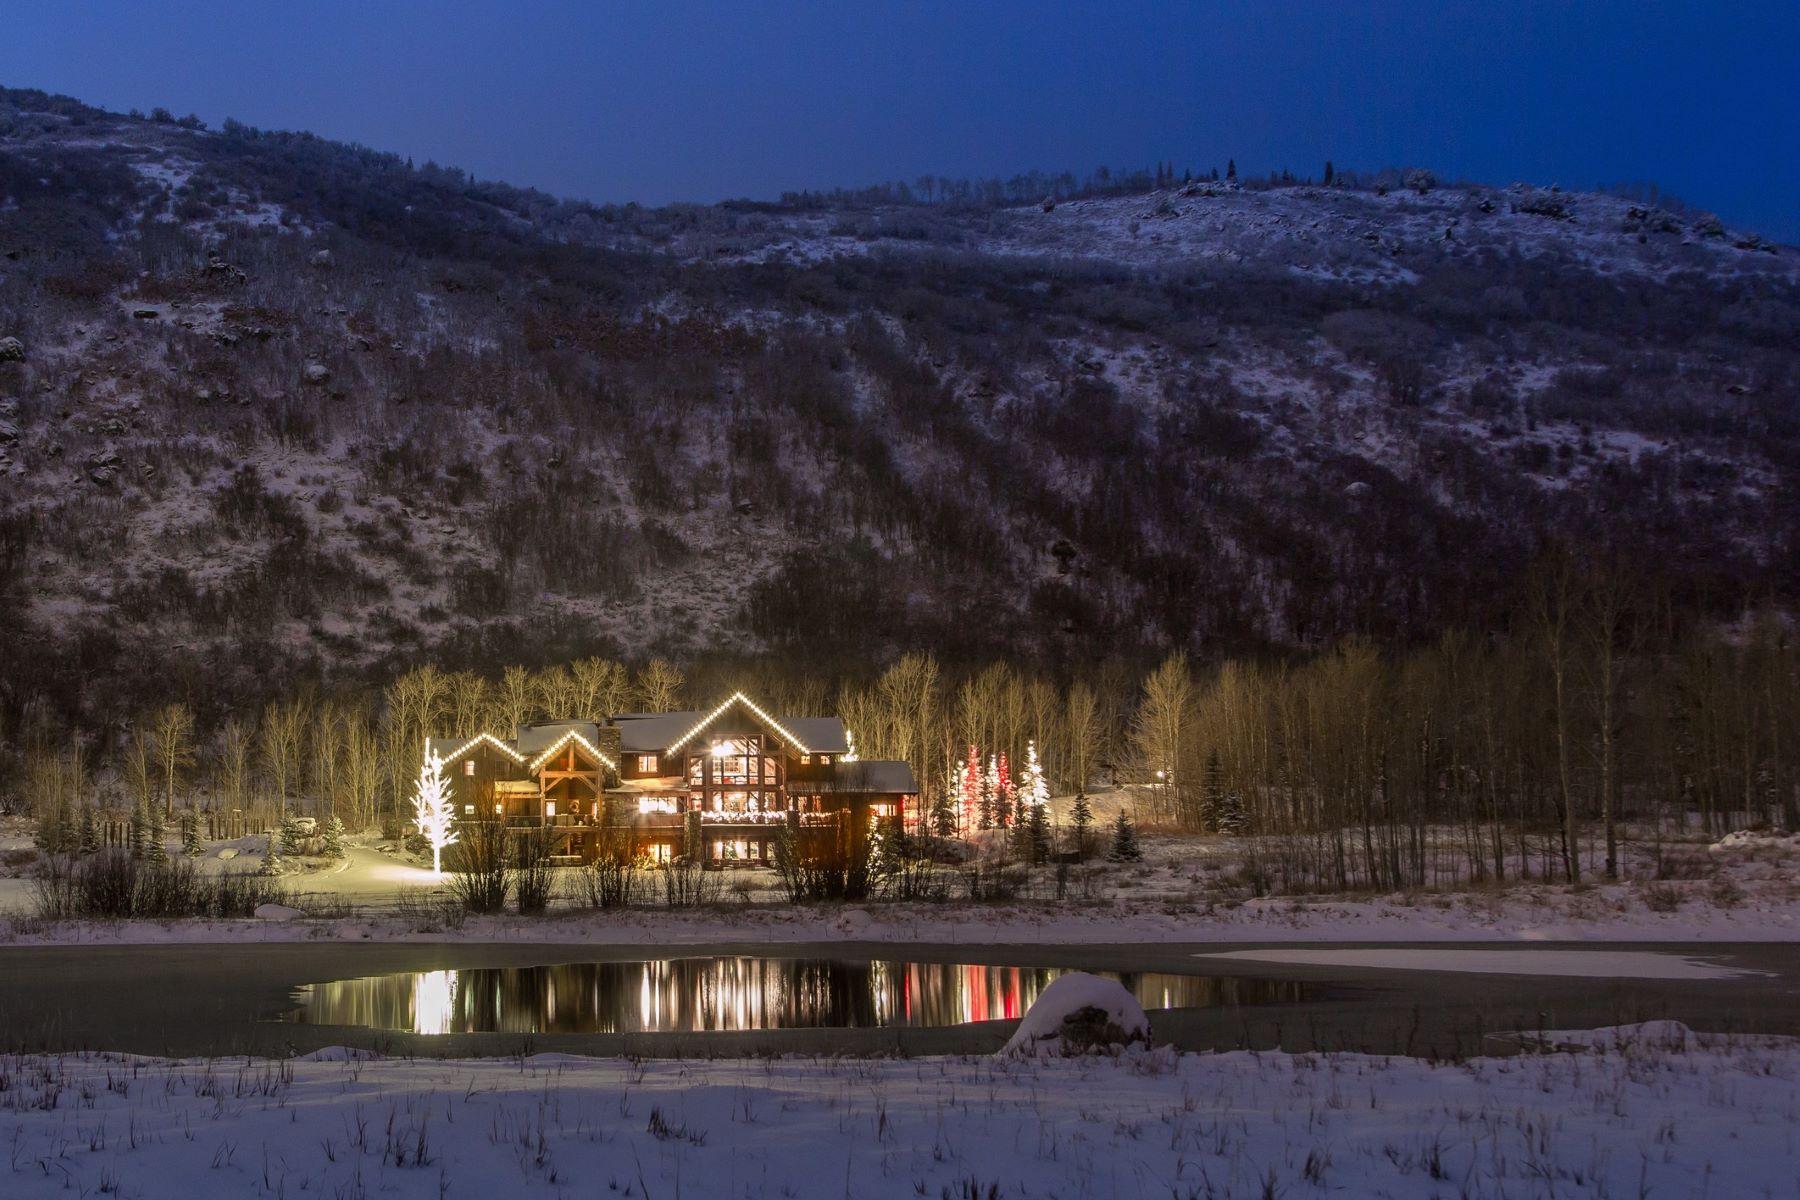 Elkins Meadow Masterpiece 2890 Bucks Path Steamboat Springs, Colorado 80487 United States